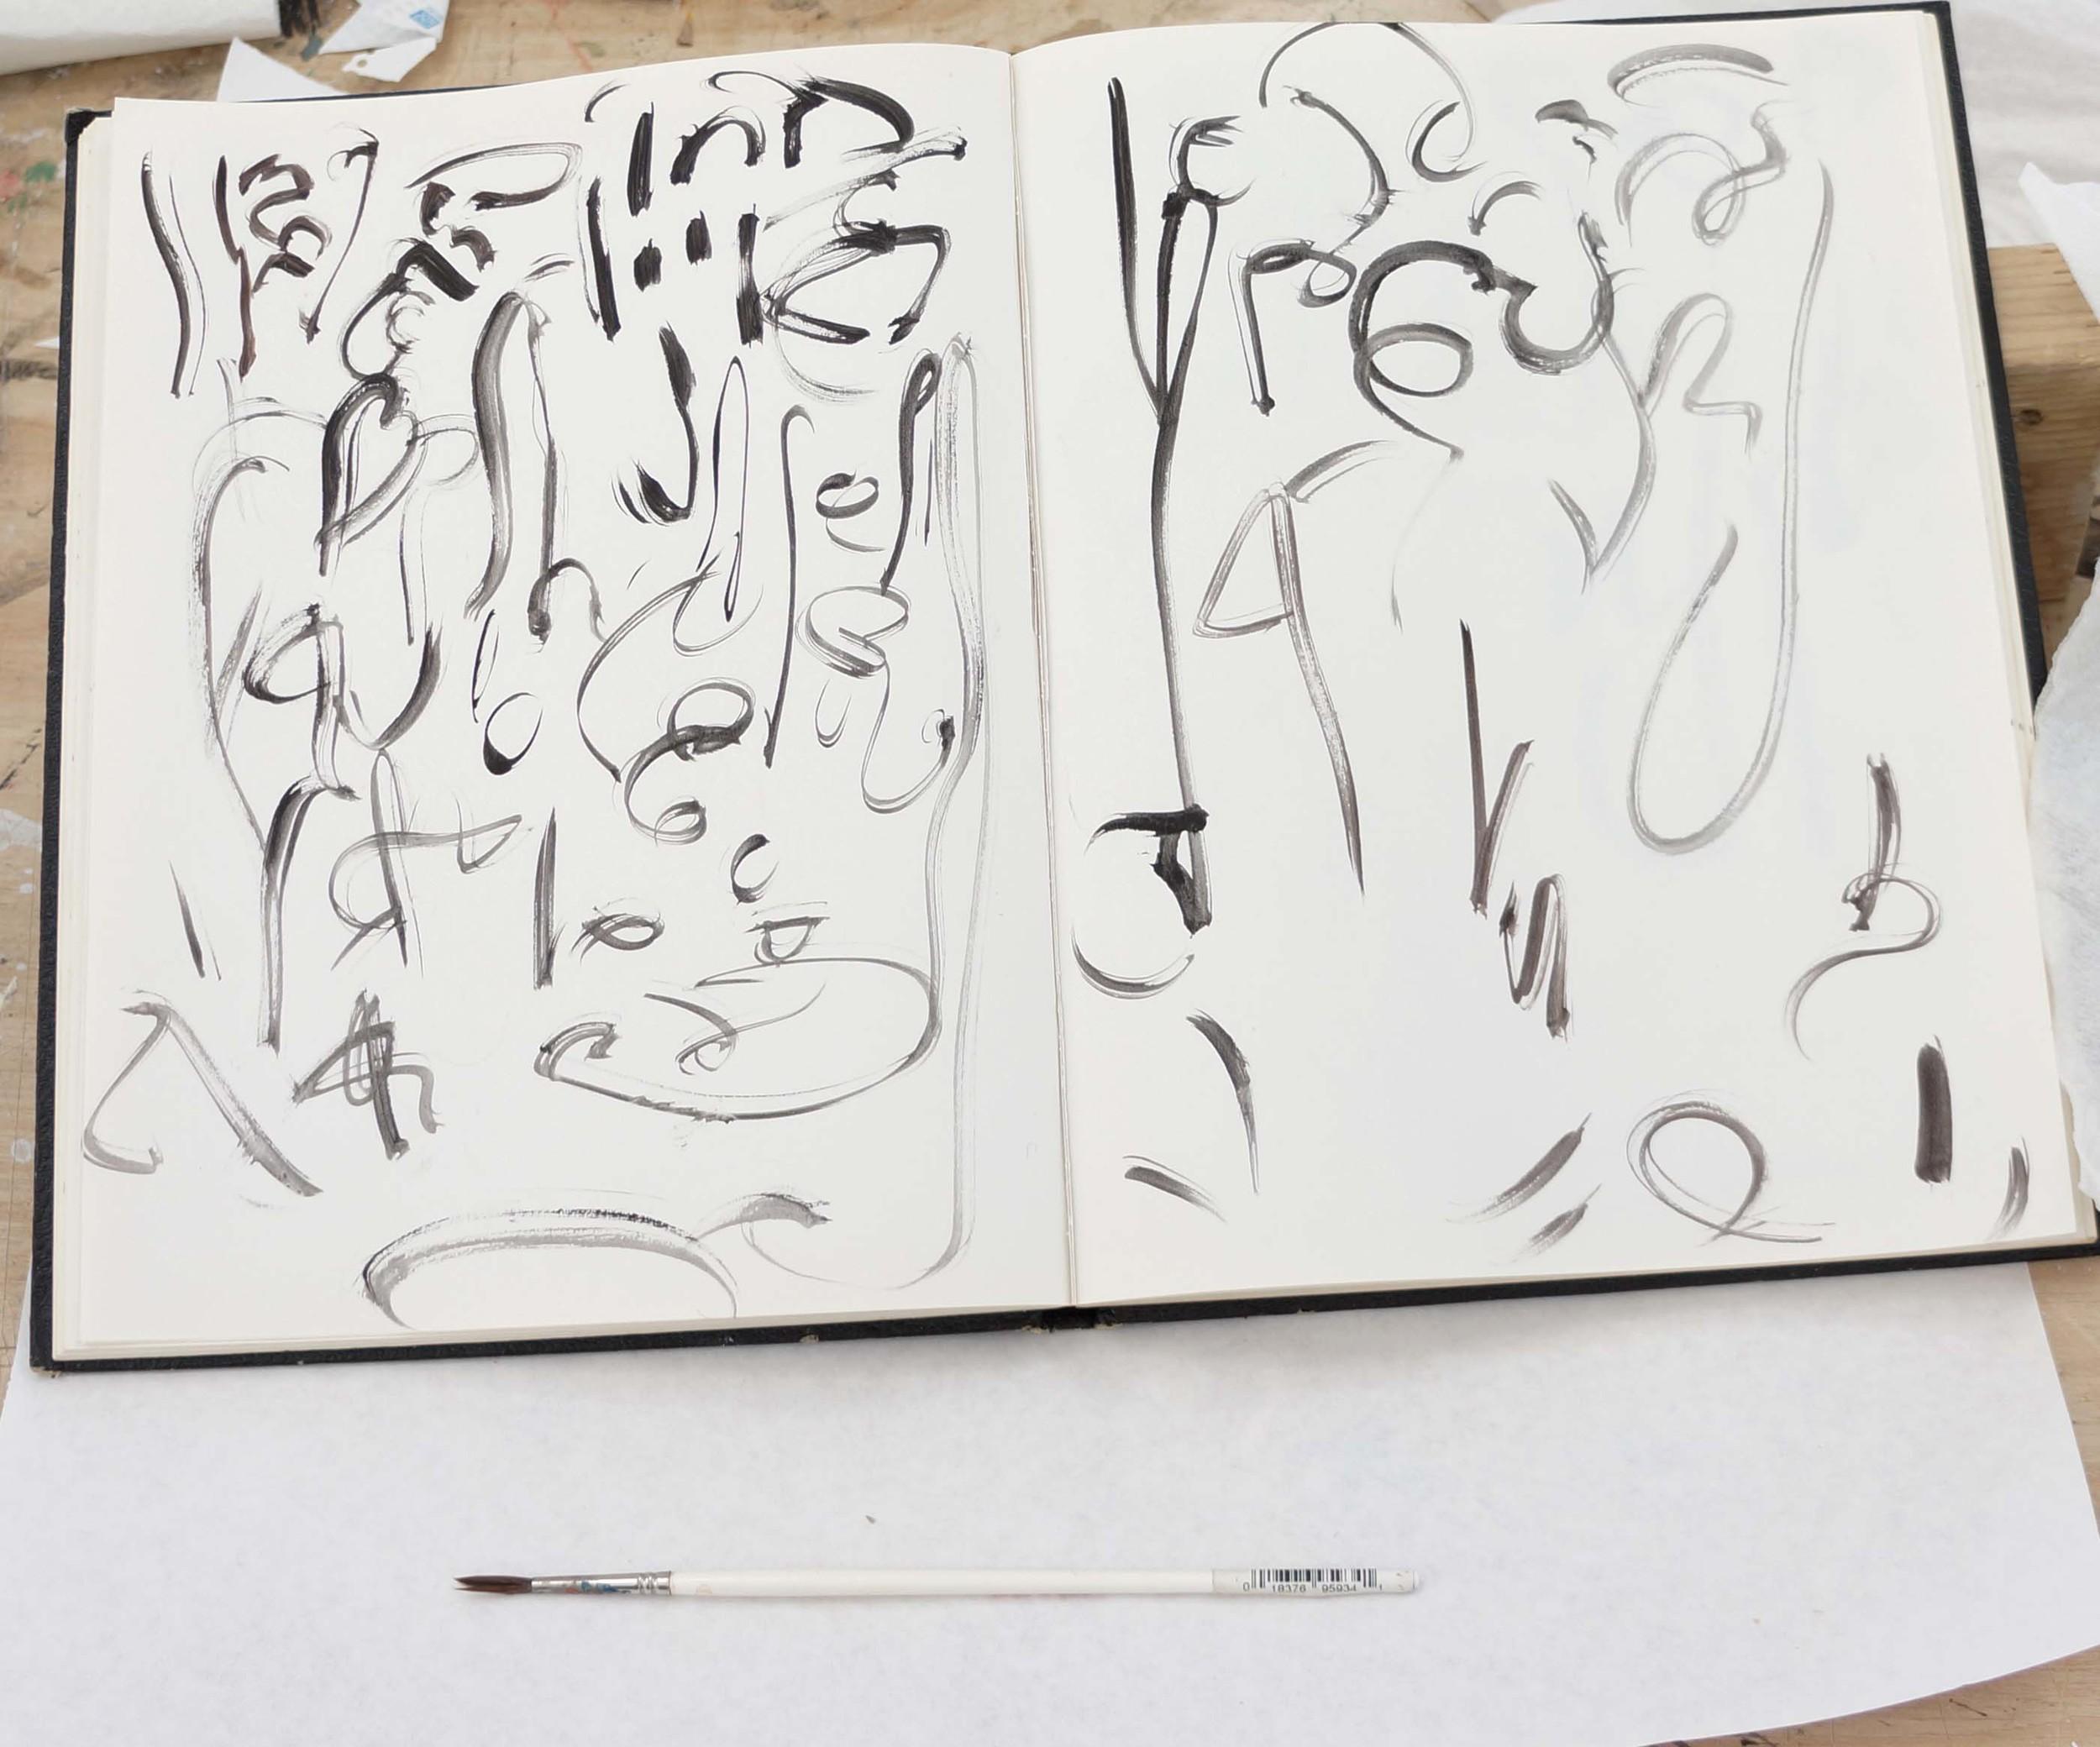 site-2-21-14 calligraphy 1.jpg